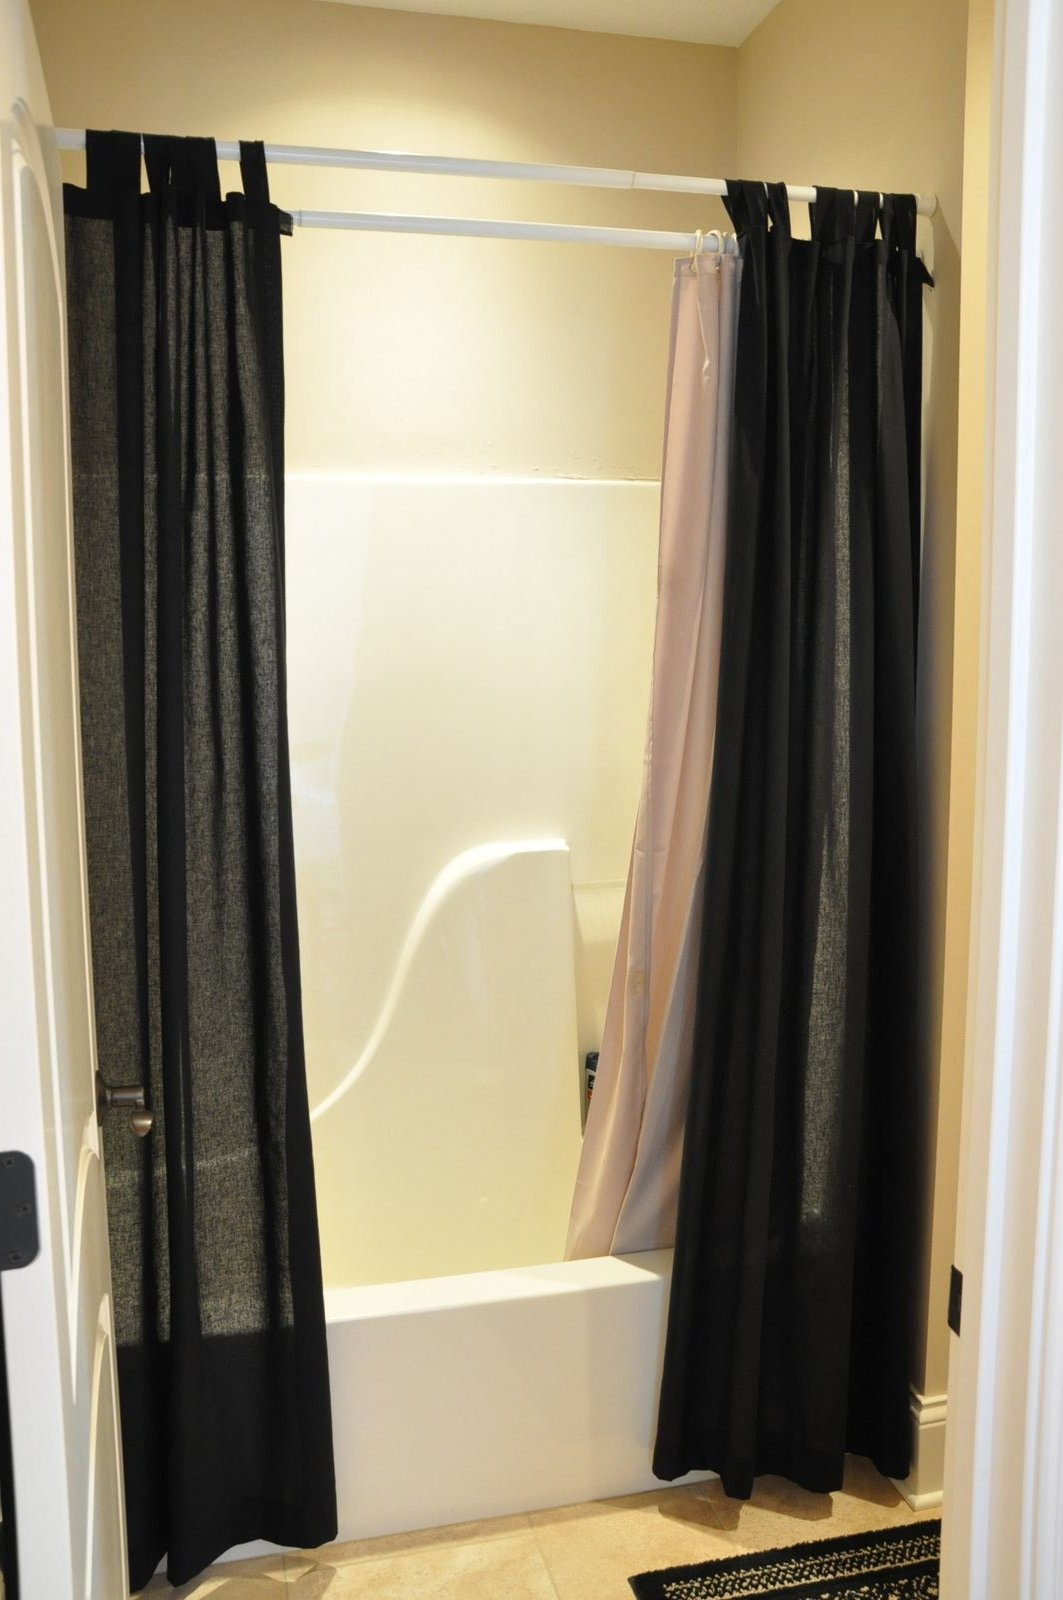 Black bathroom shower curtains - Shower Curtains With Flair